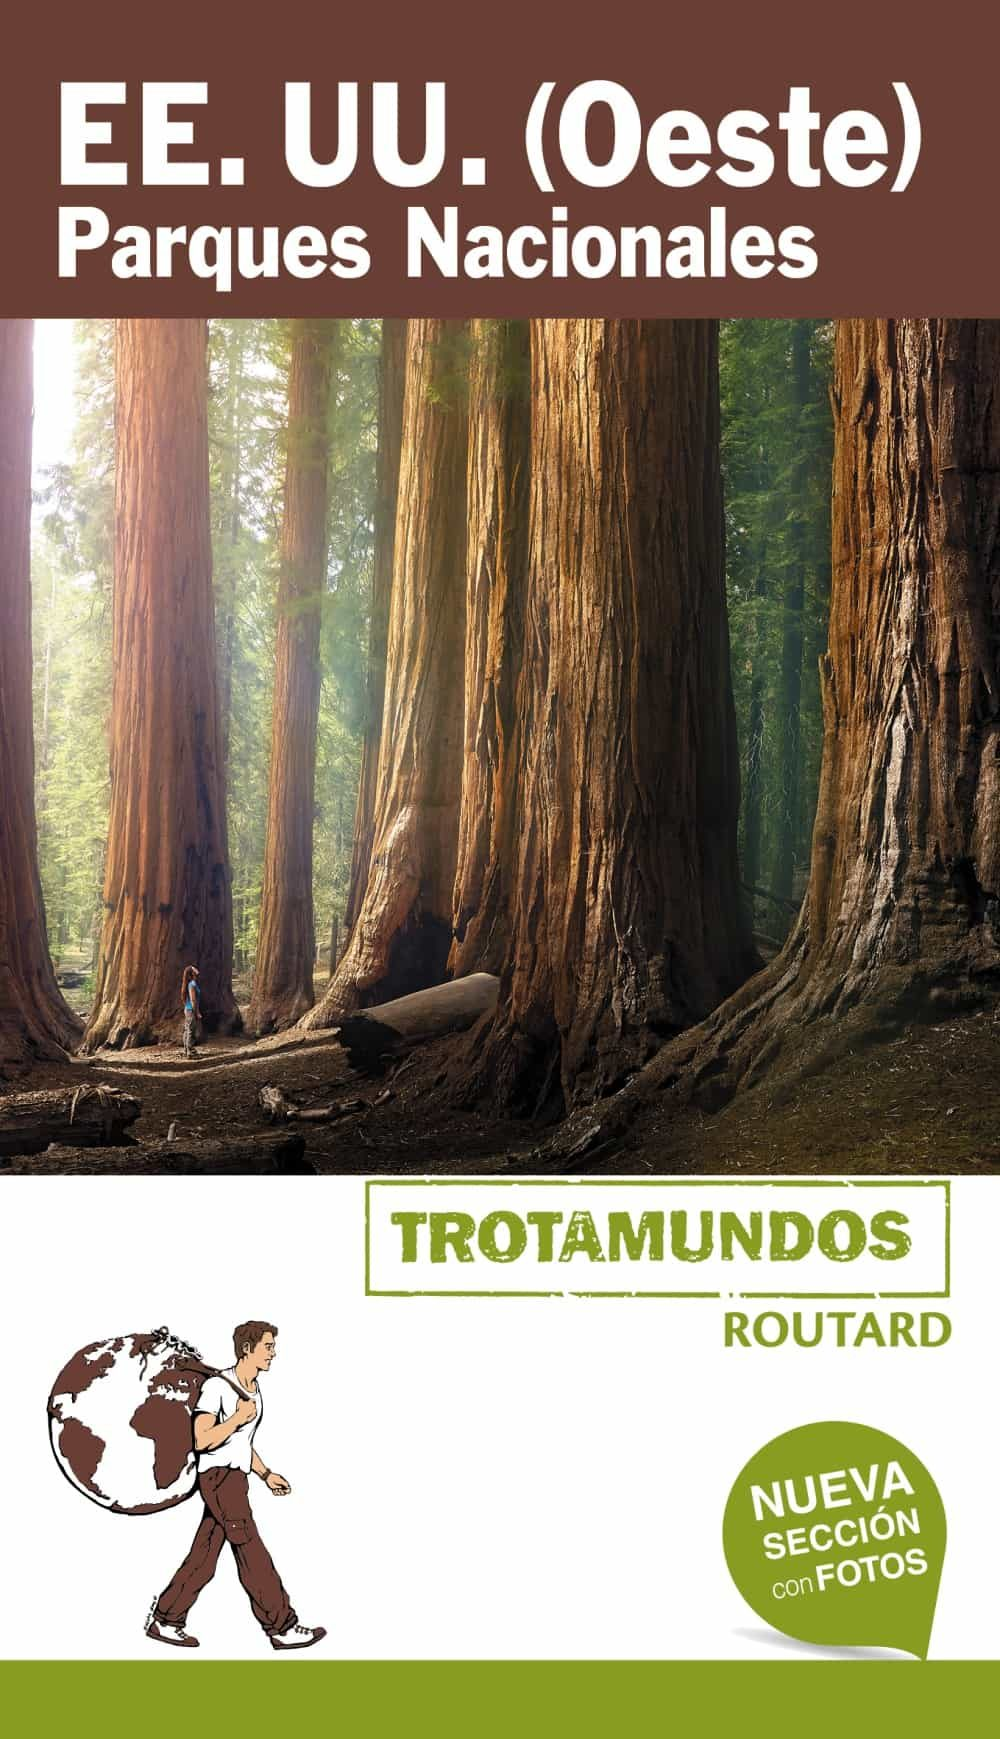 estados unidos (oeste) parques nacionales 2018 (trotamundos) 2ª ed.-philippe gloaguen-9788415501916